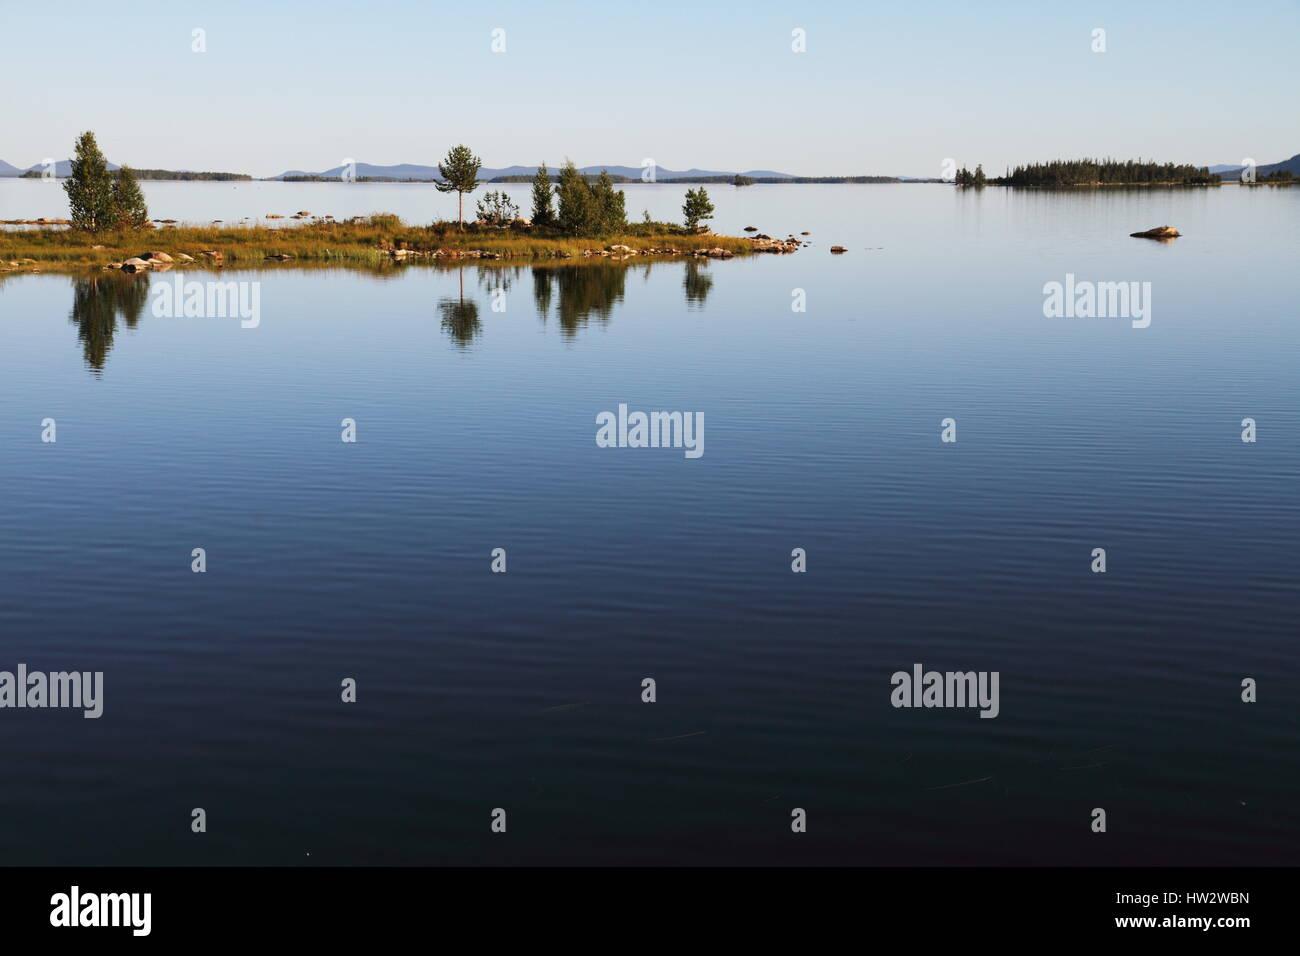 A summer landscape in Lappland, Northern Sweden - Stock Image